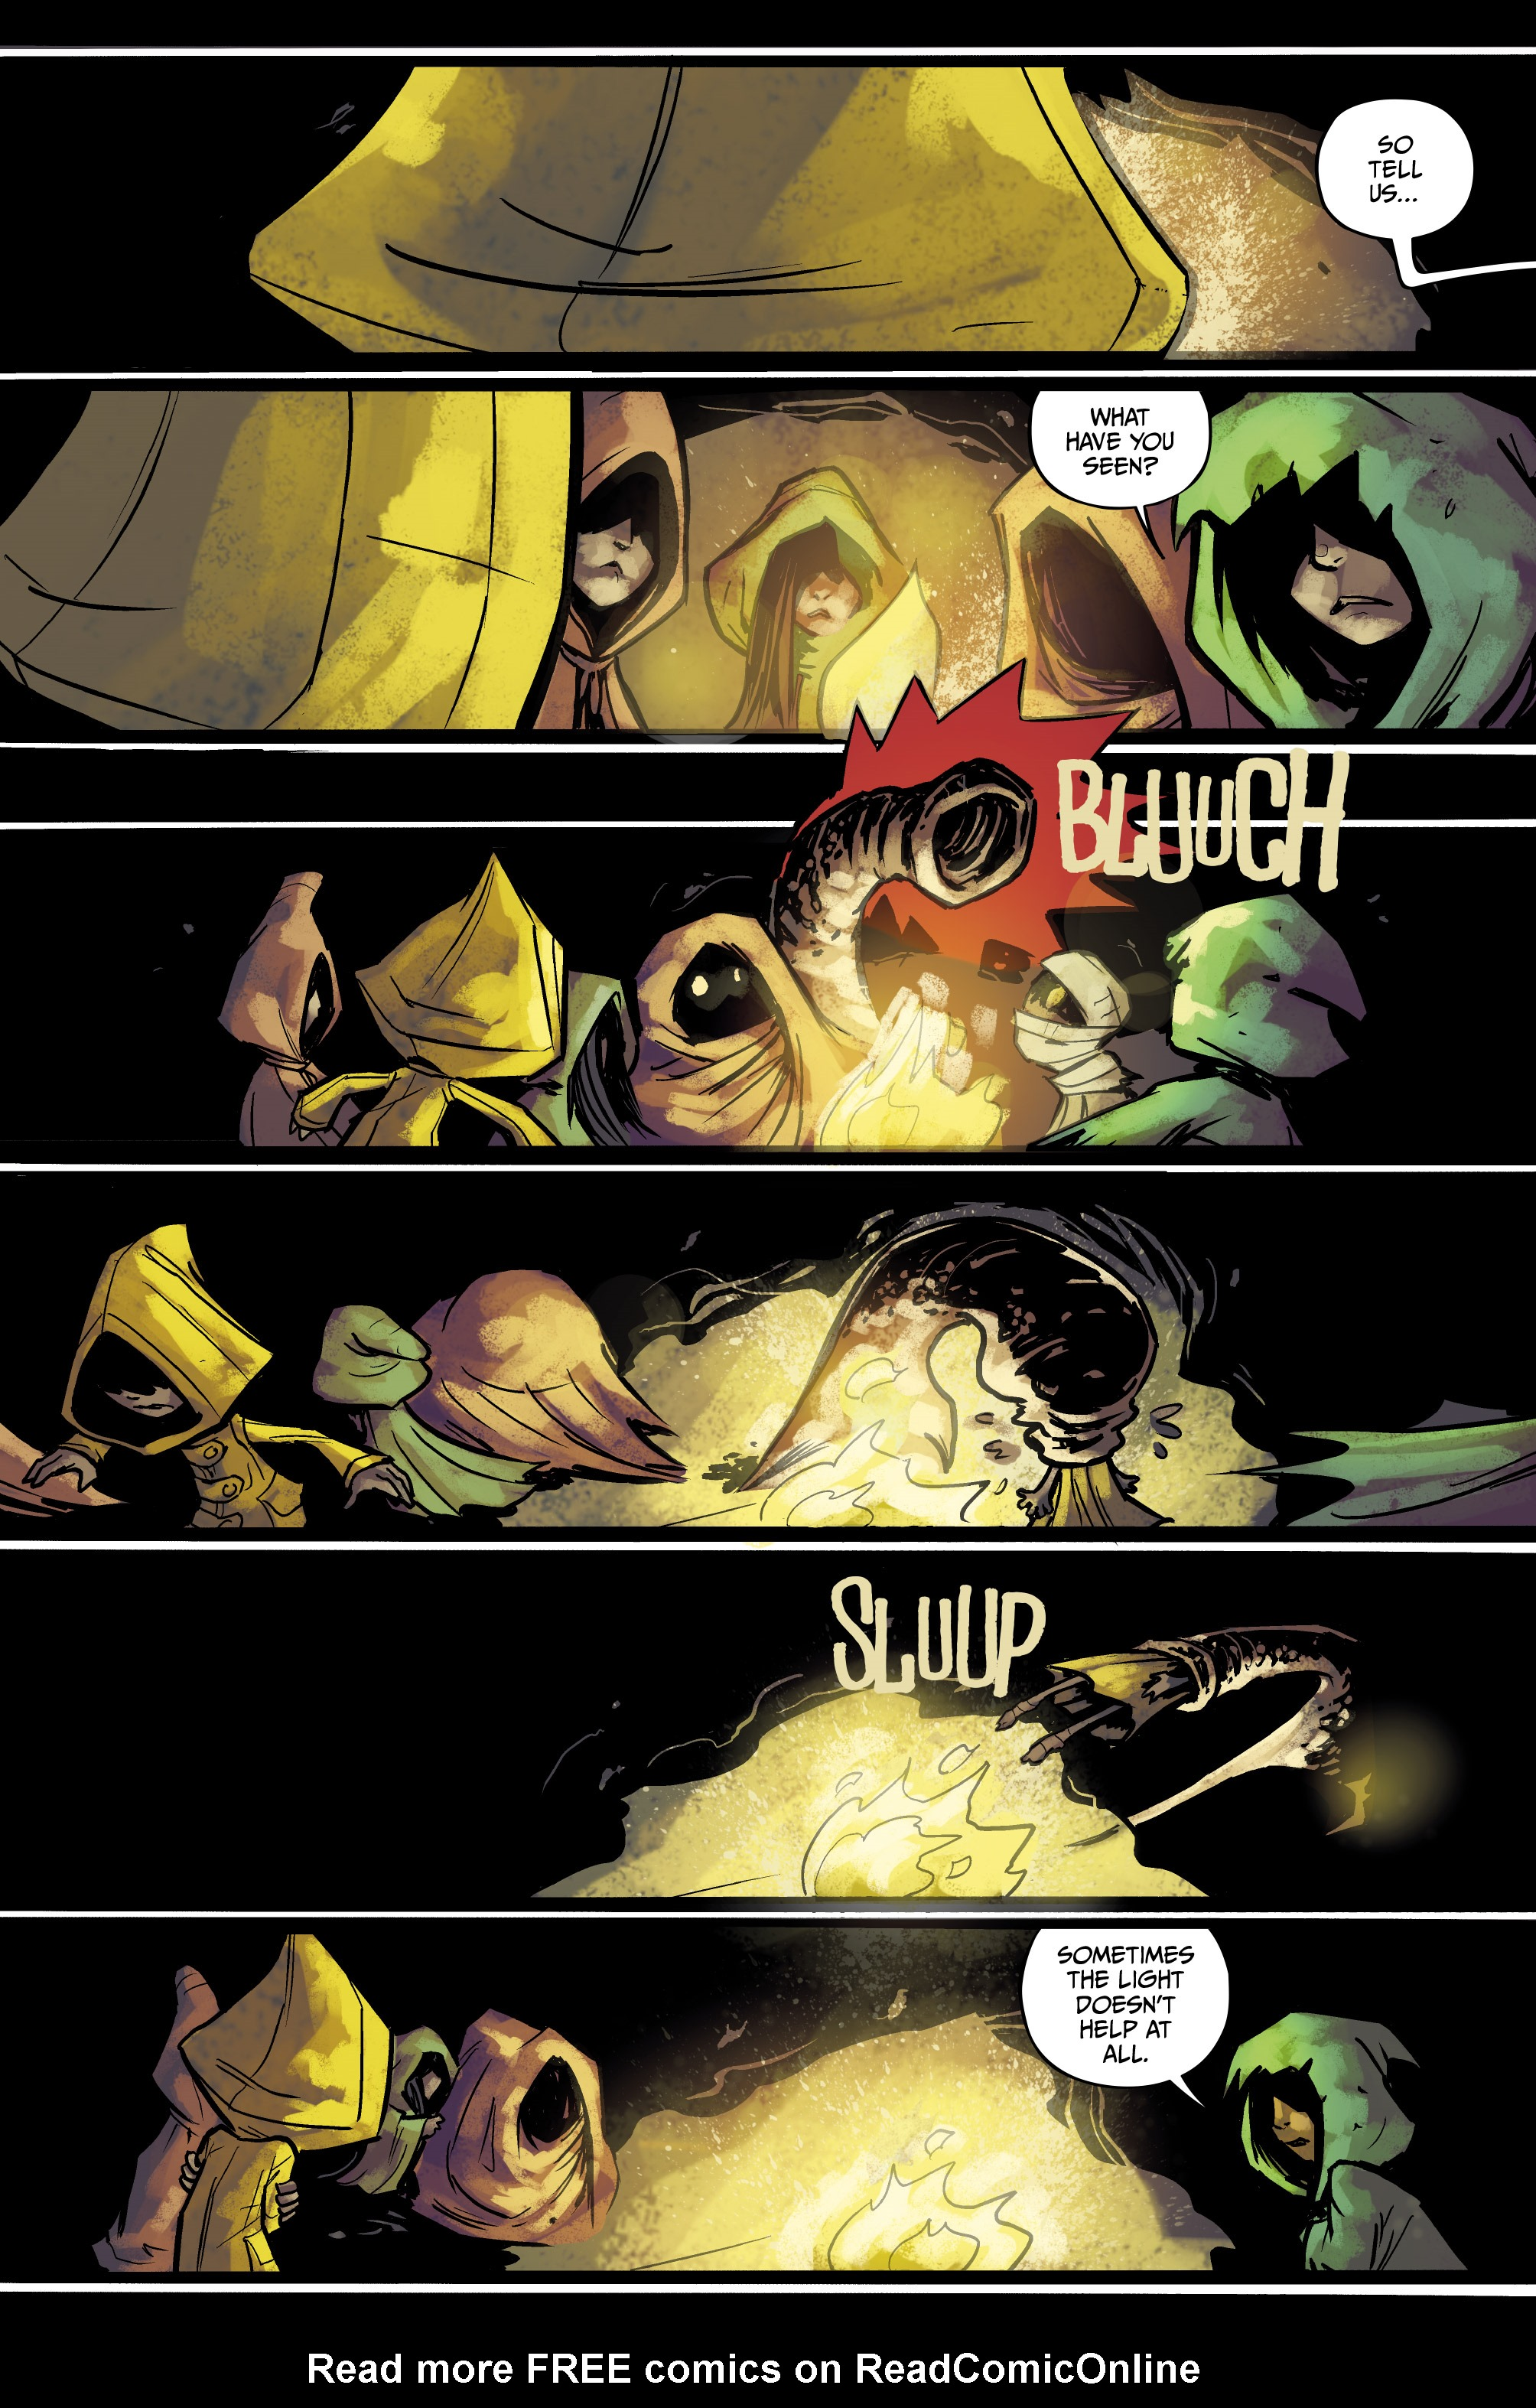 Read online Little Nightmares comic -  Issue #1 - 9